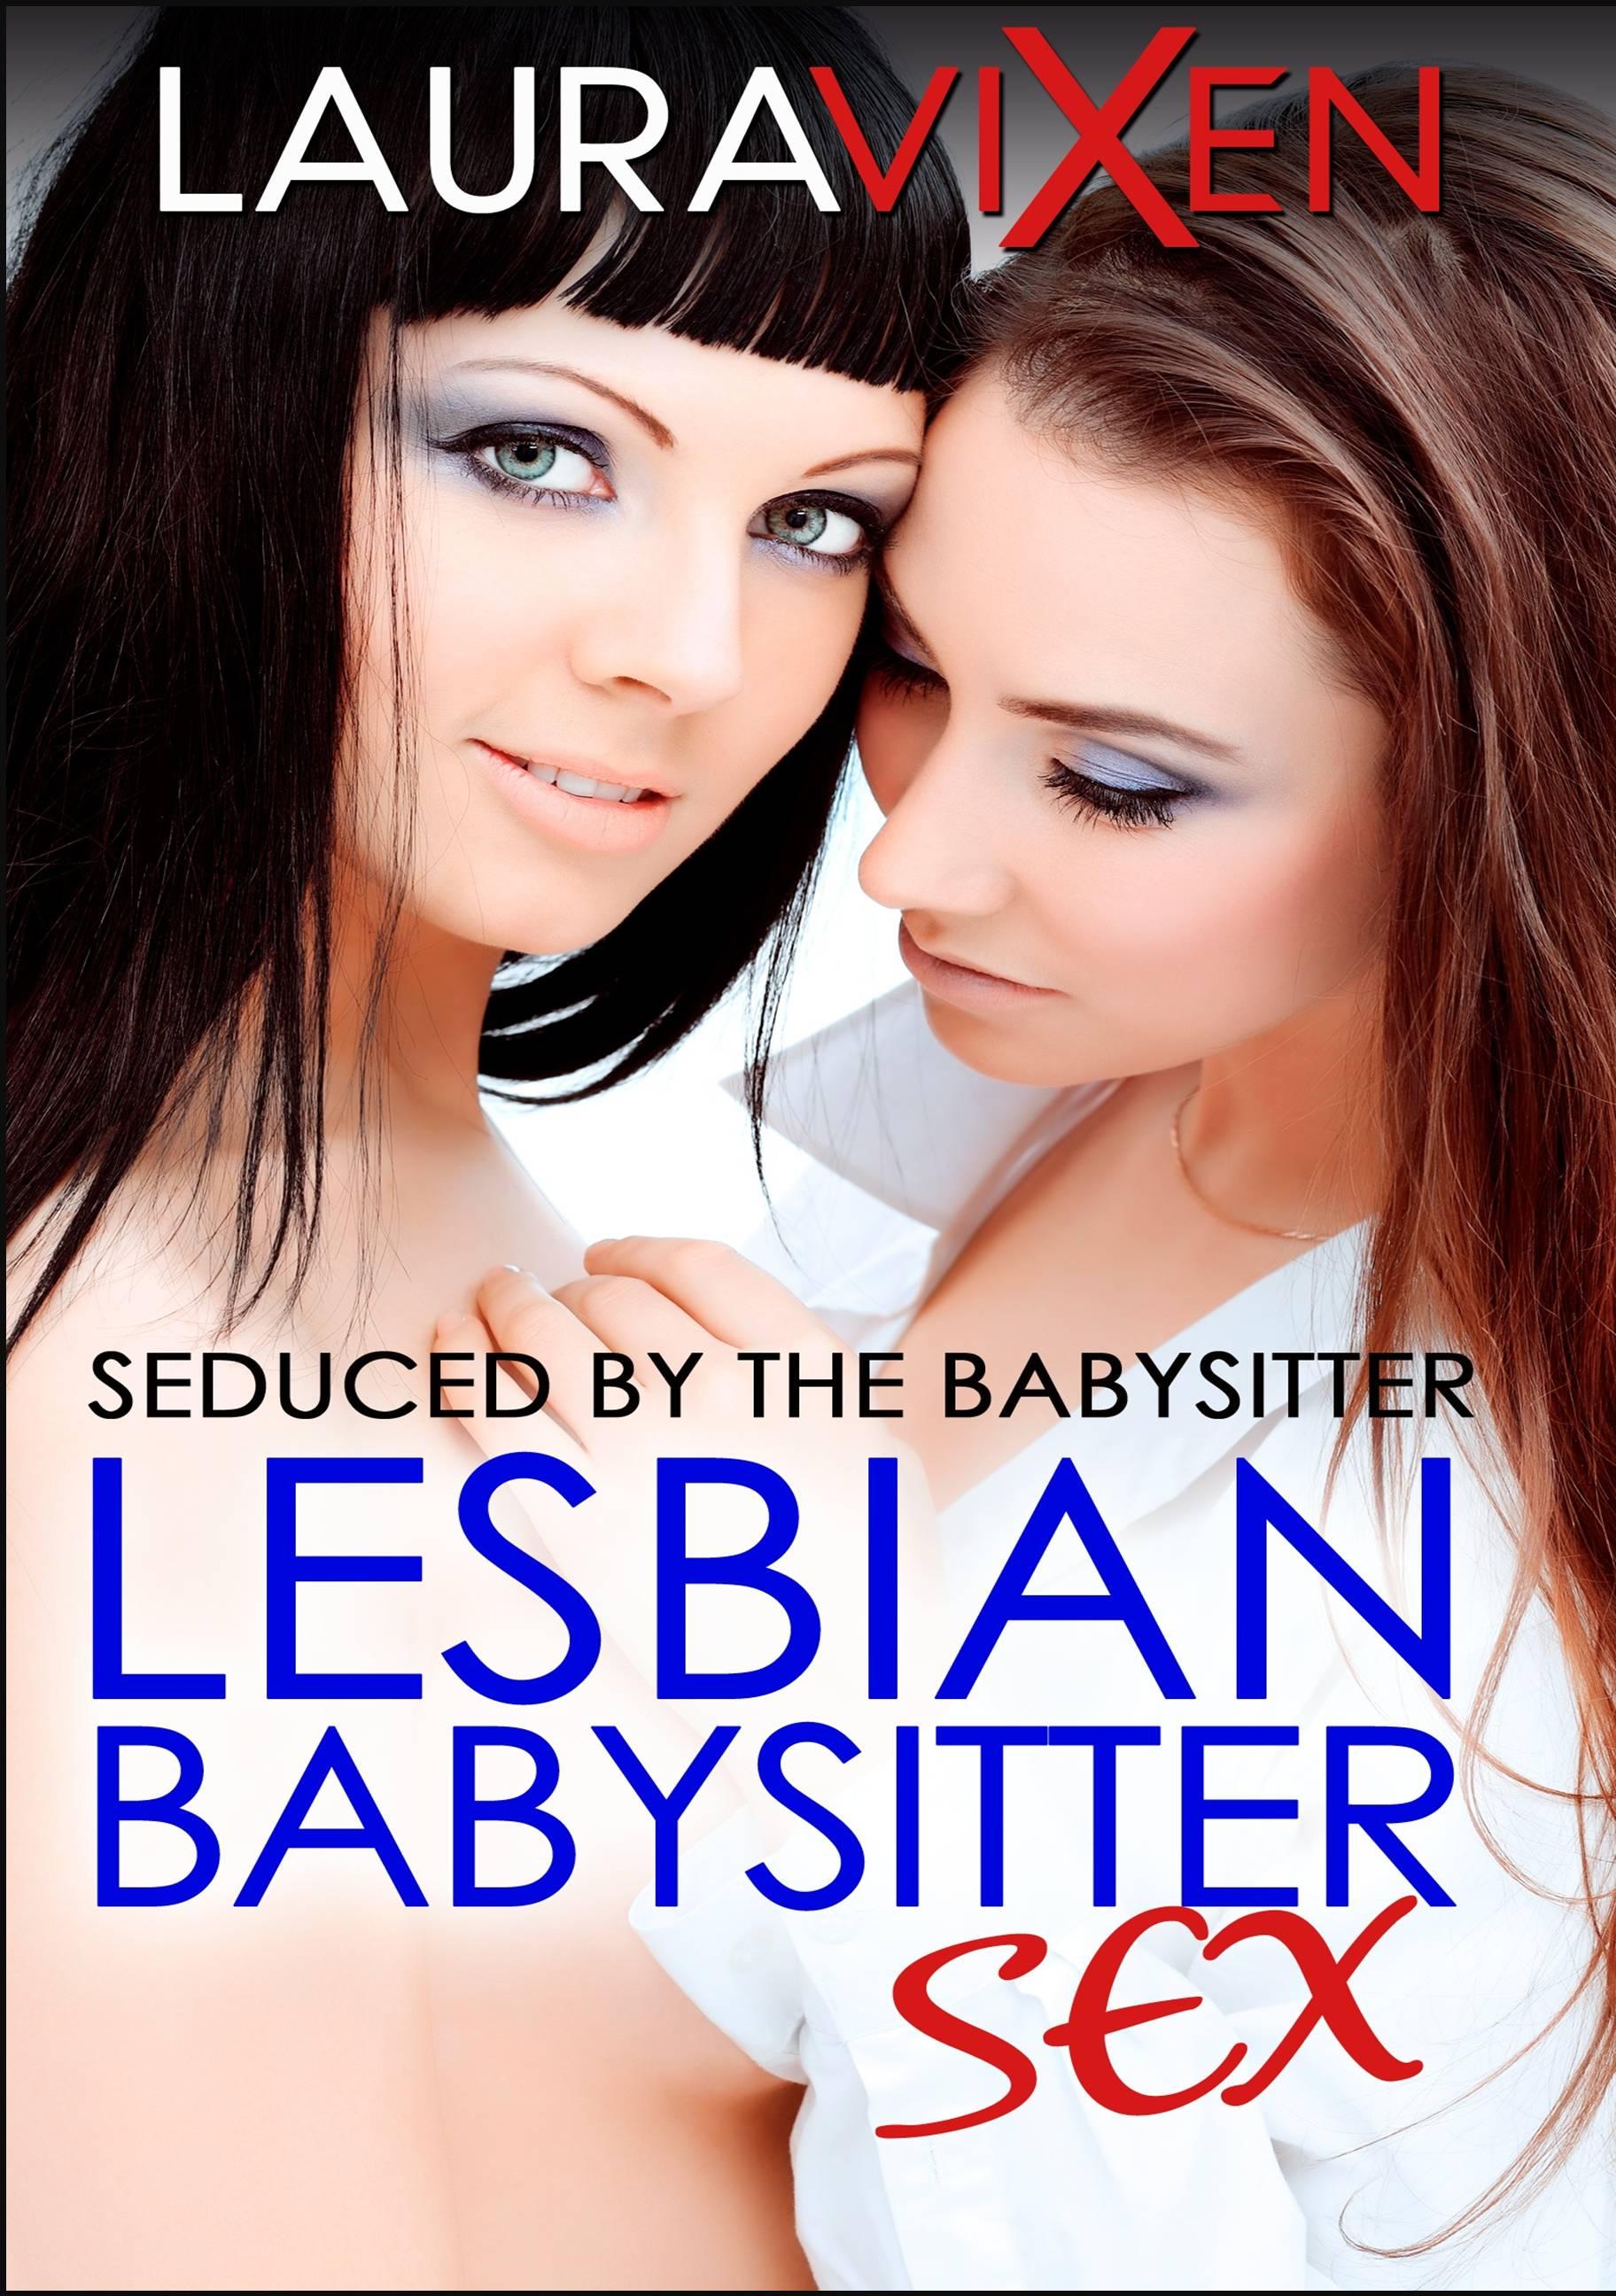 Free lesbian babysitter sex stories